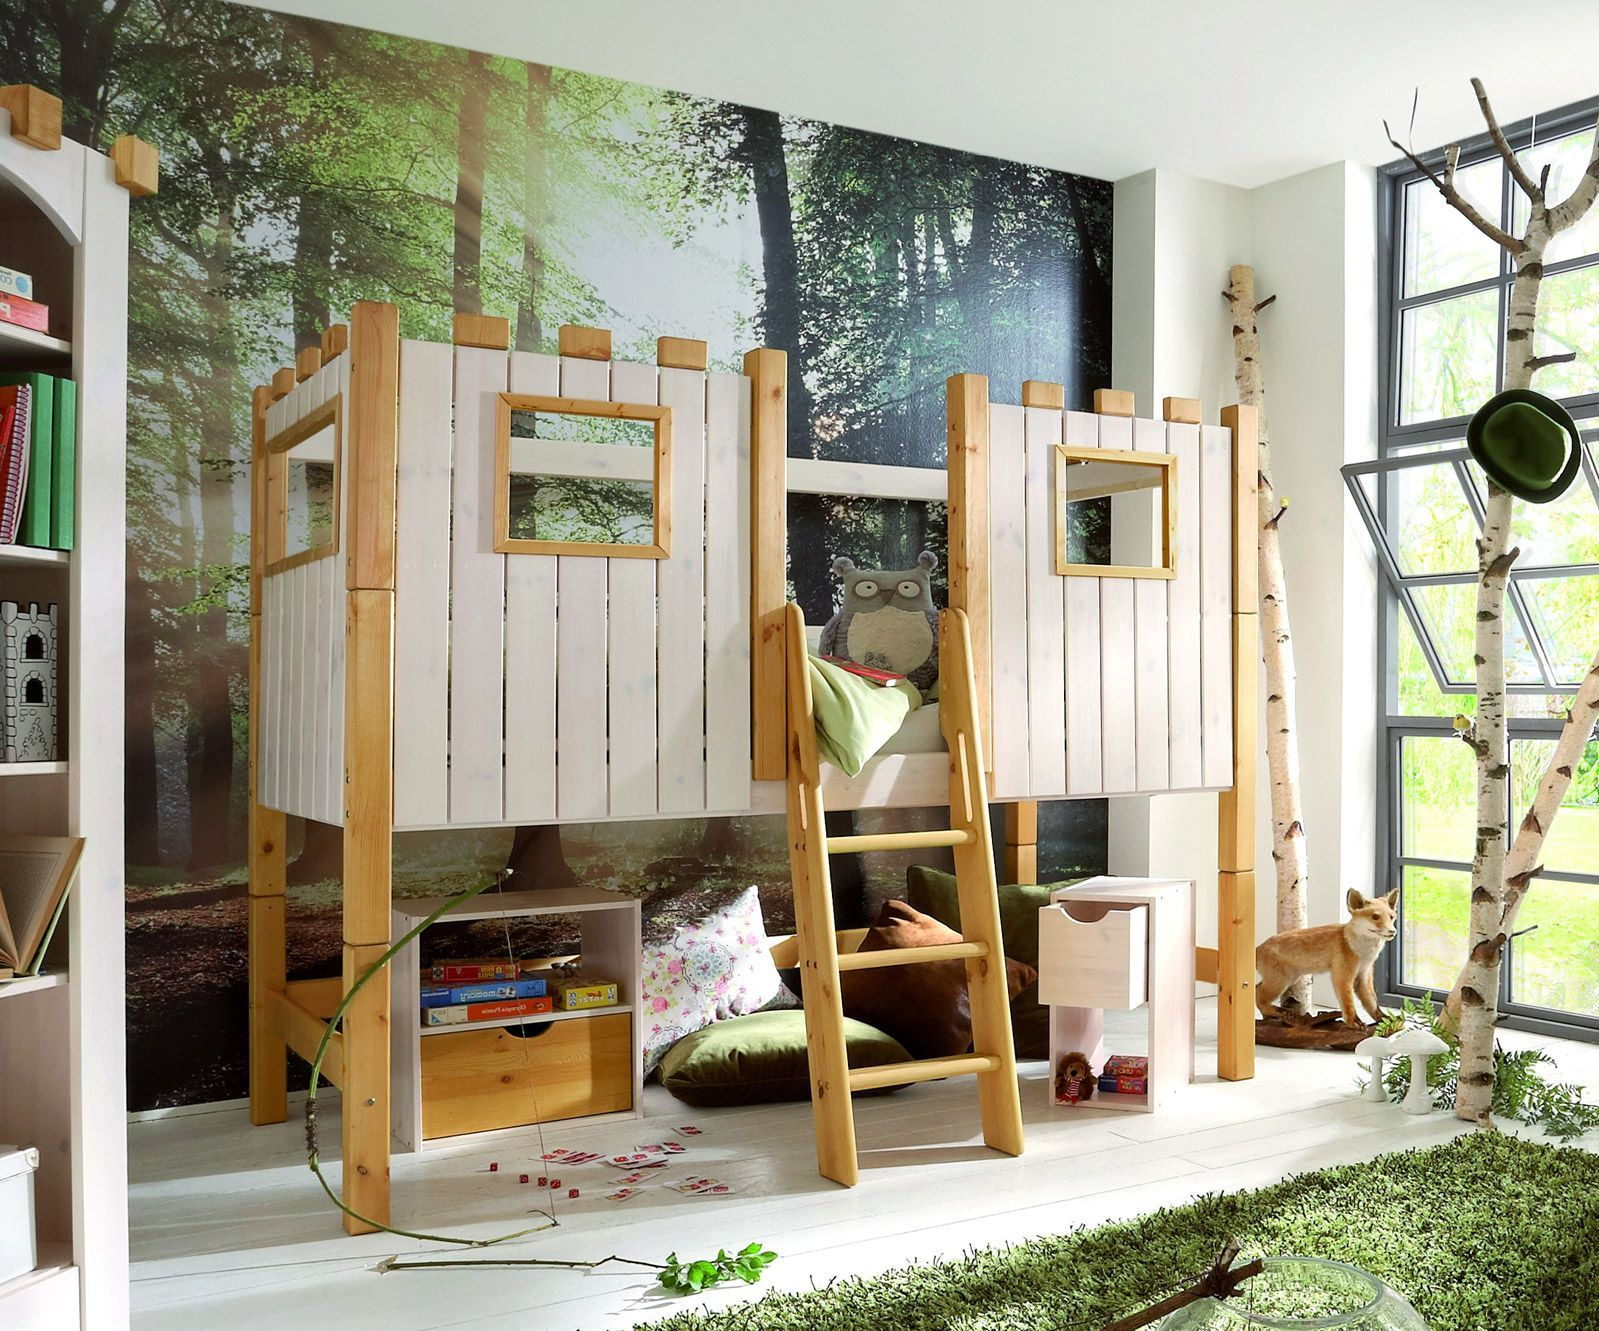 Etagenbett Burg : Etagenbett burg hochbett mit betten lifetime bett in neu aus